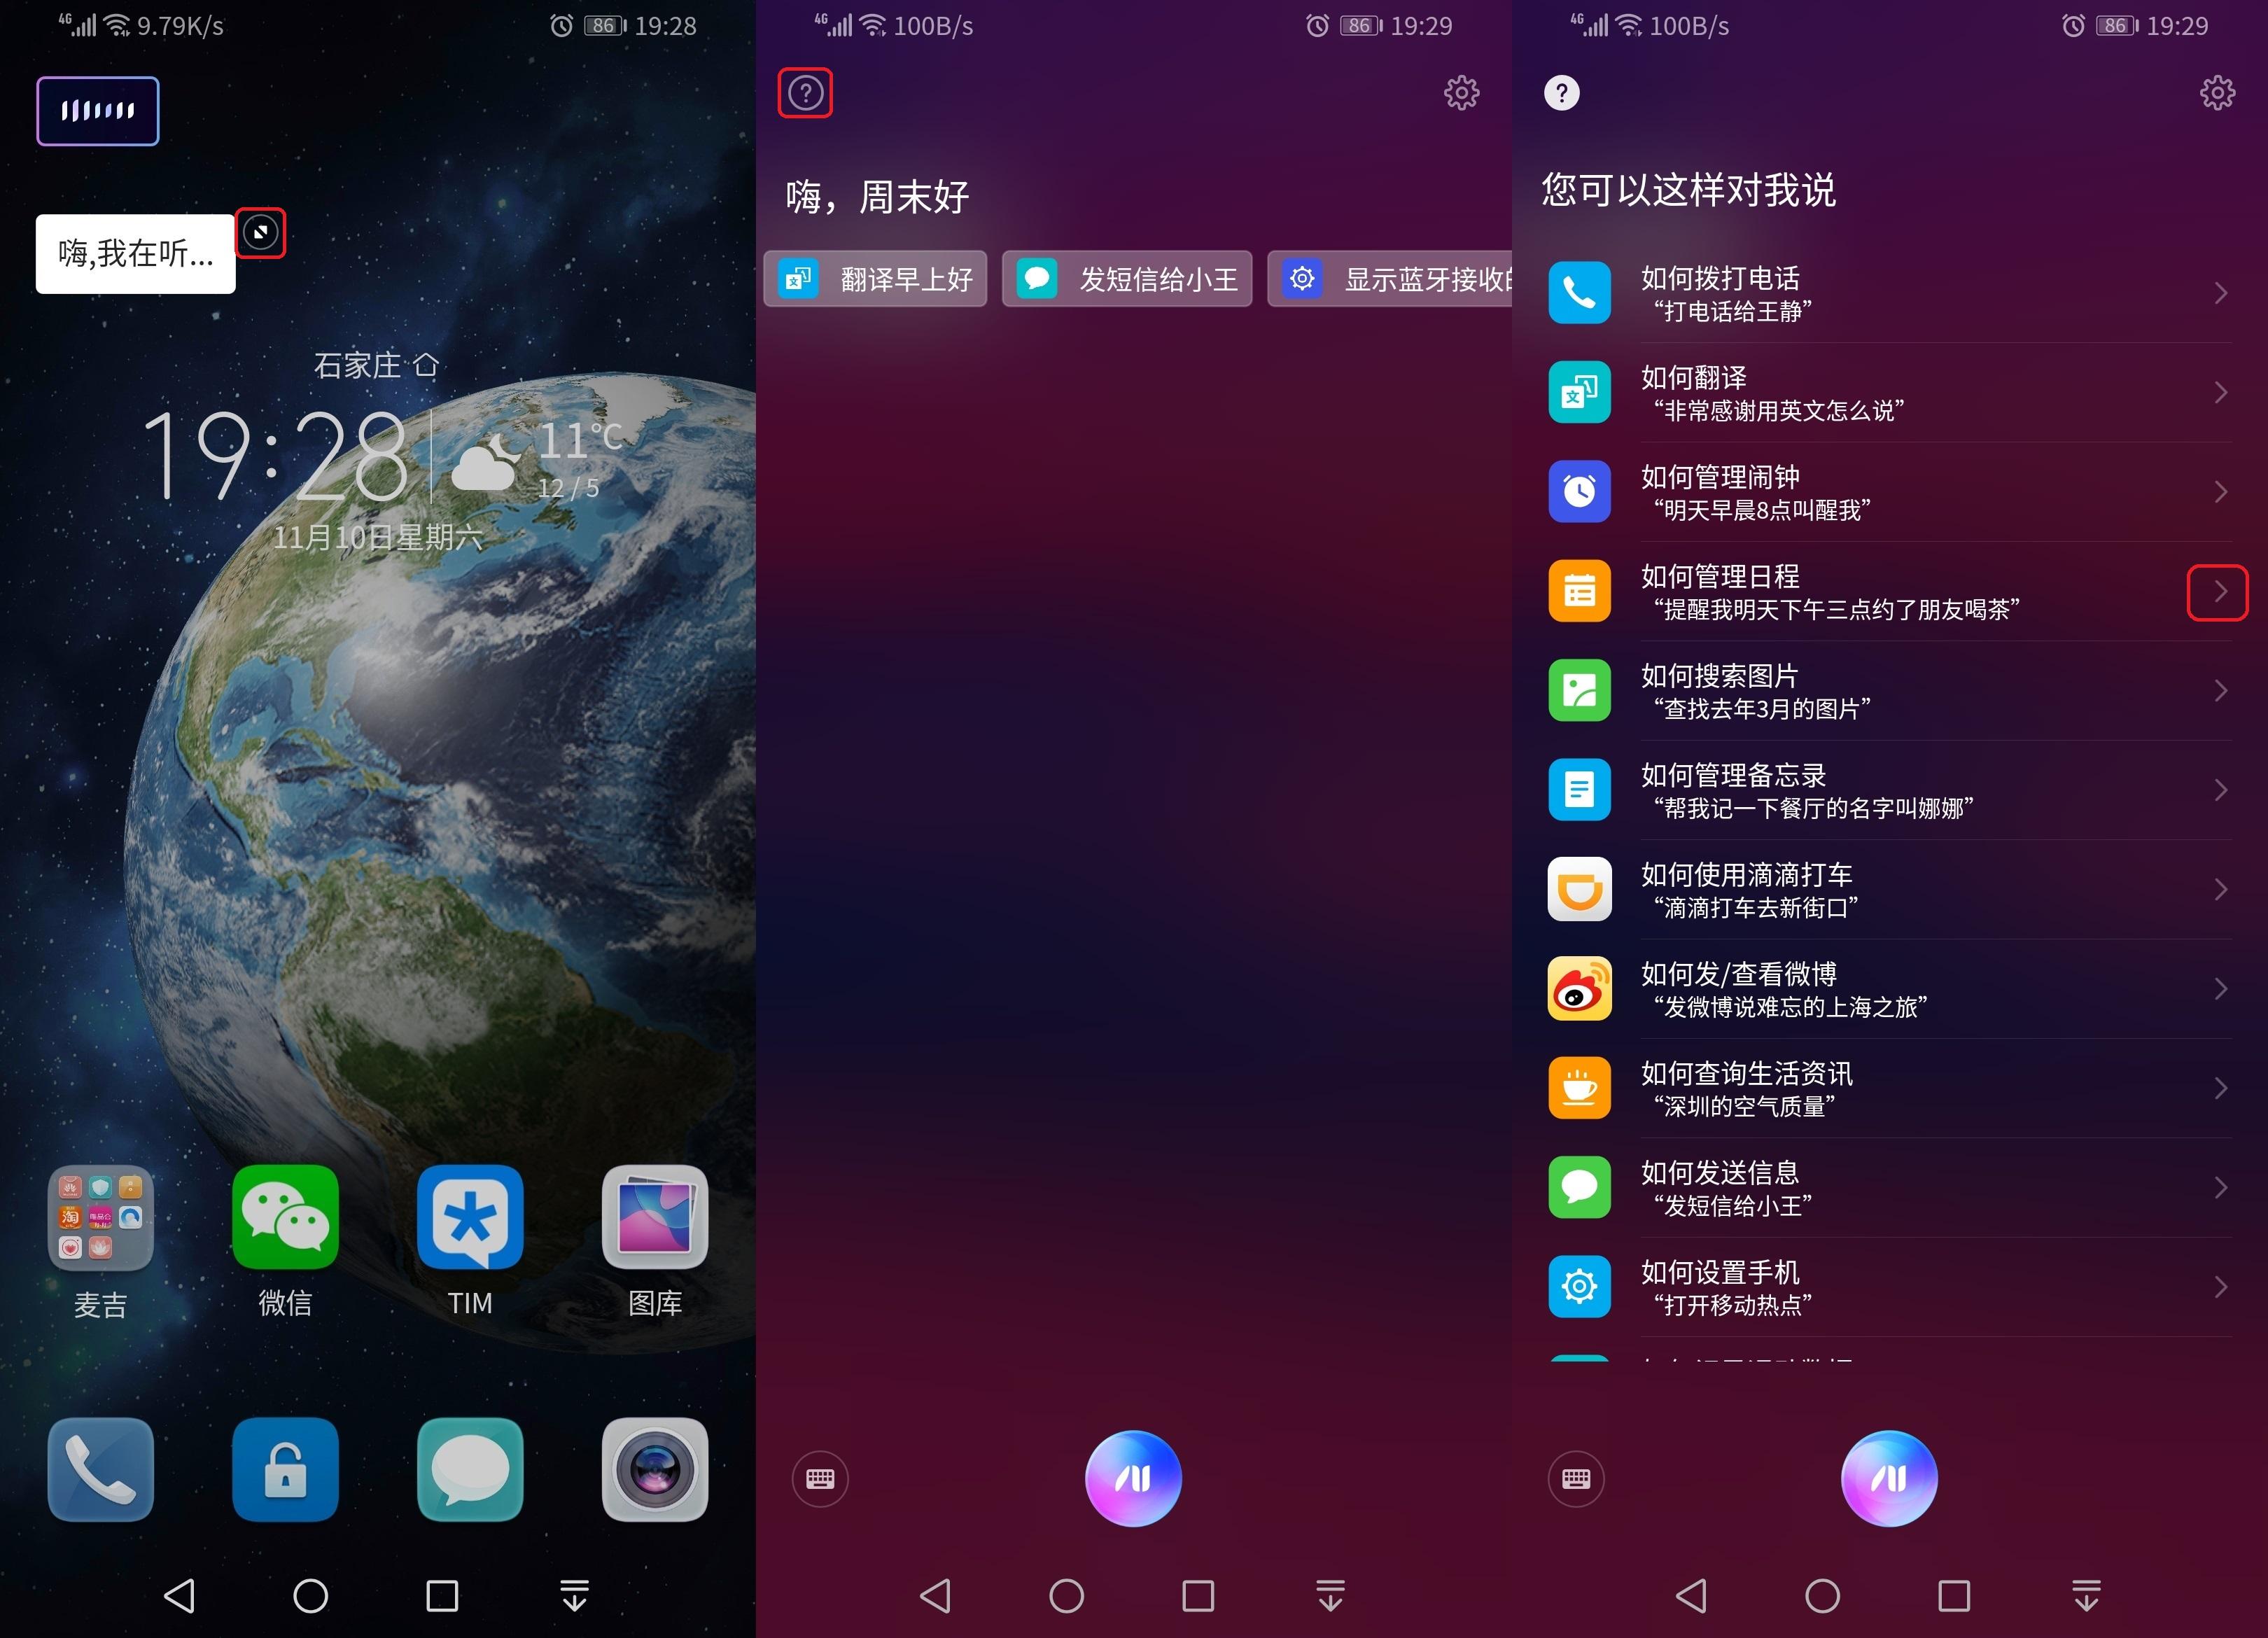 Screenshot_20181110_192838_com.huawei.android.lau.jpg